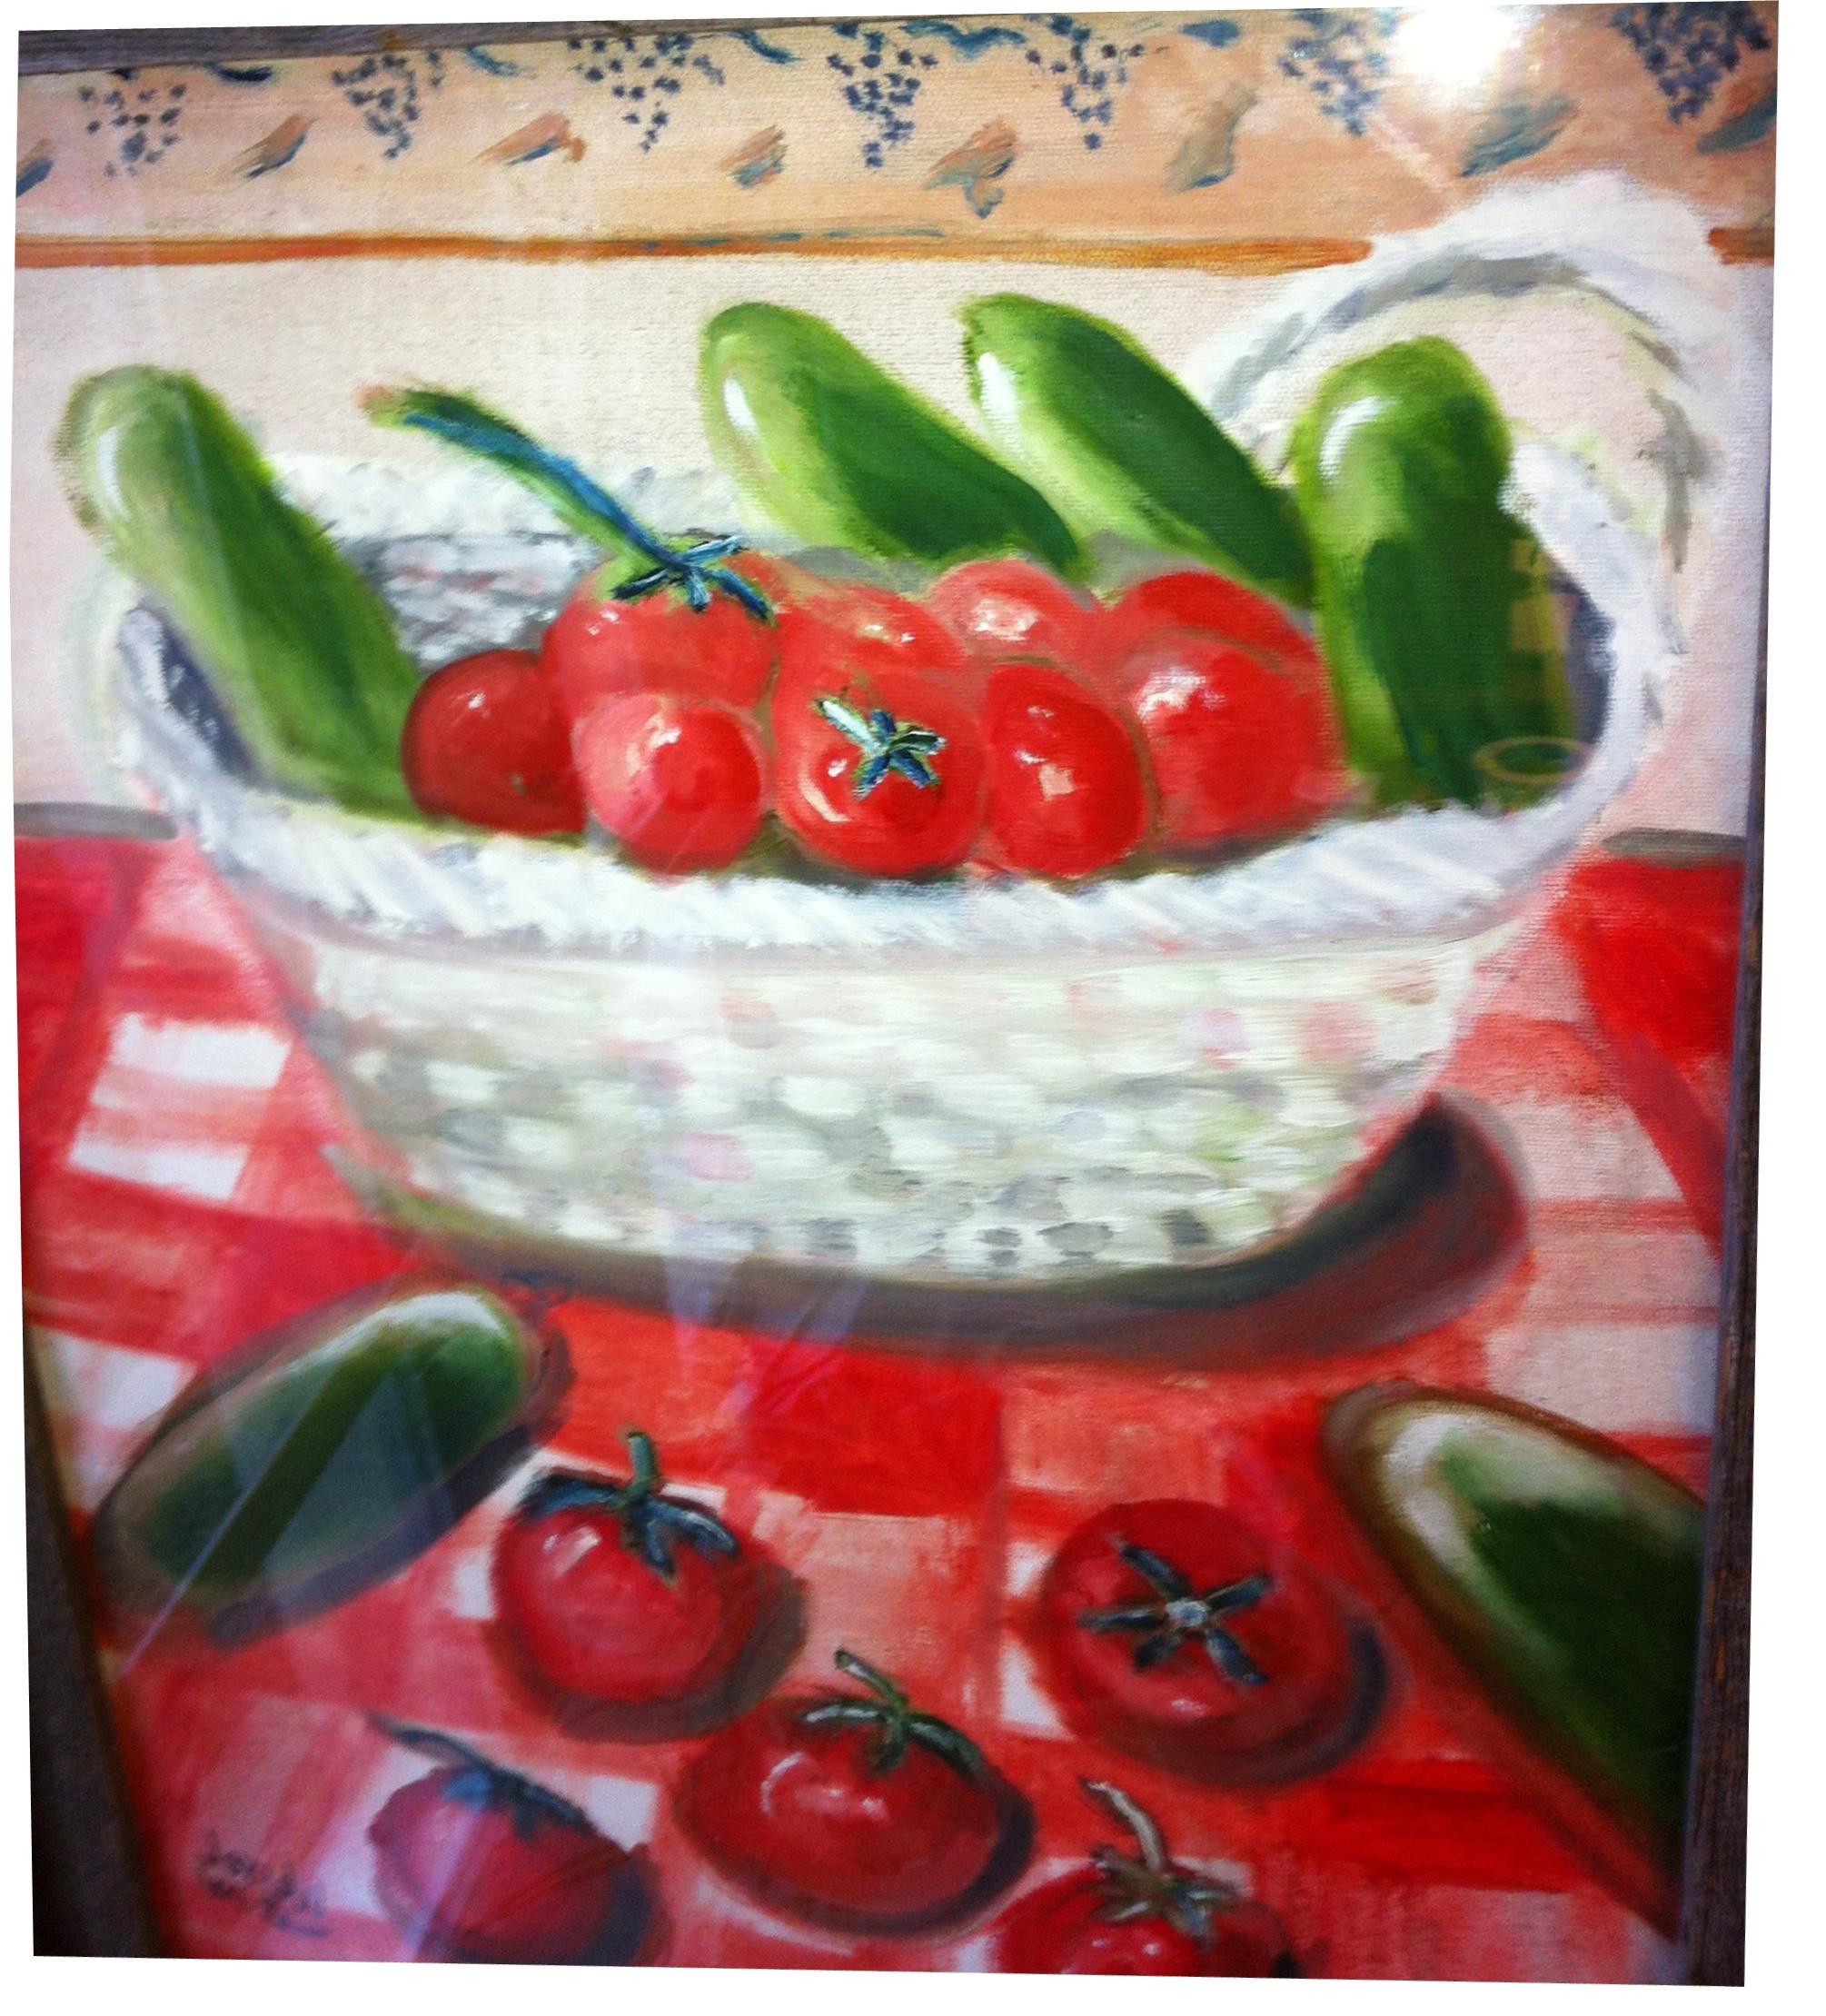 tomatosandcuc